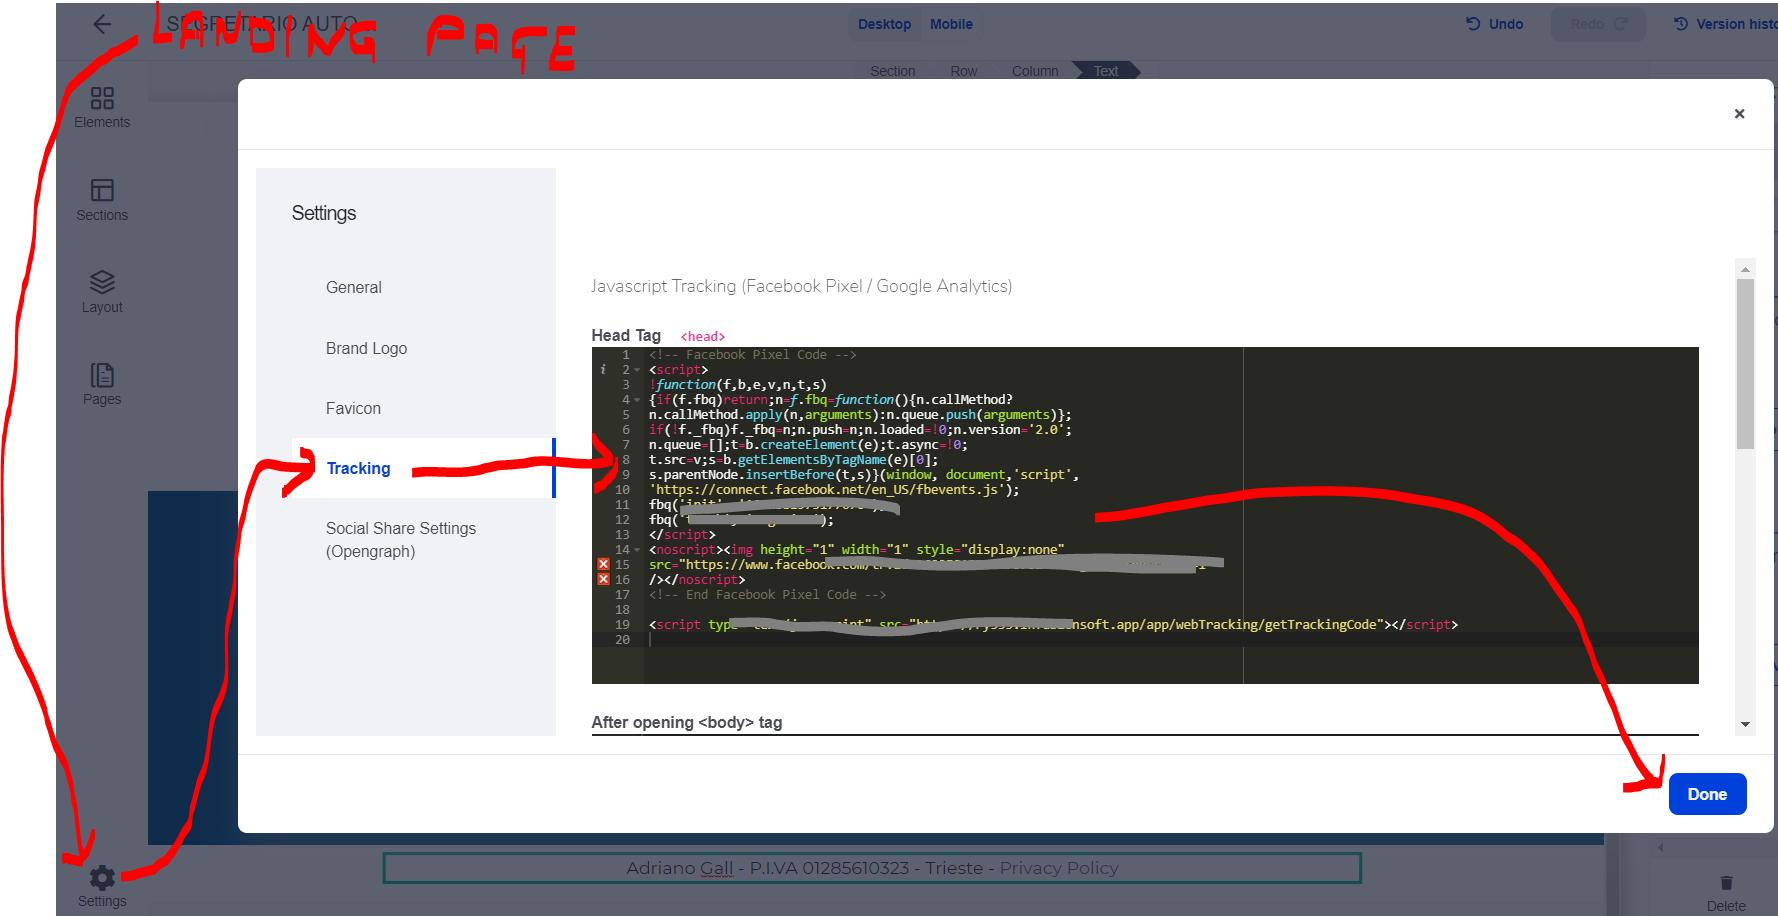 pixel landing page di Infusionsoft by Keap